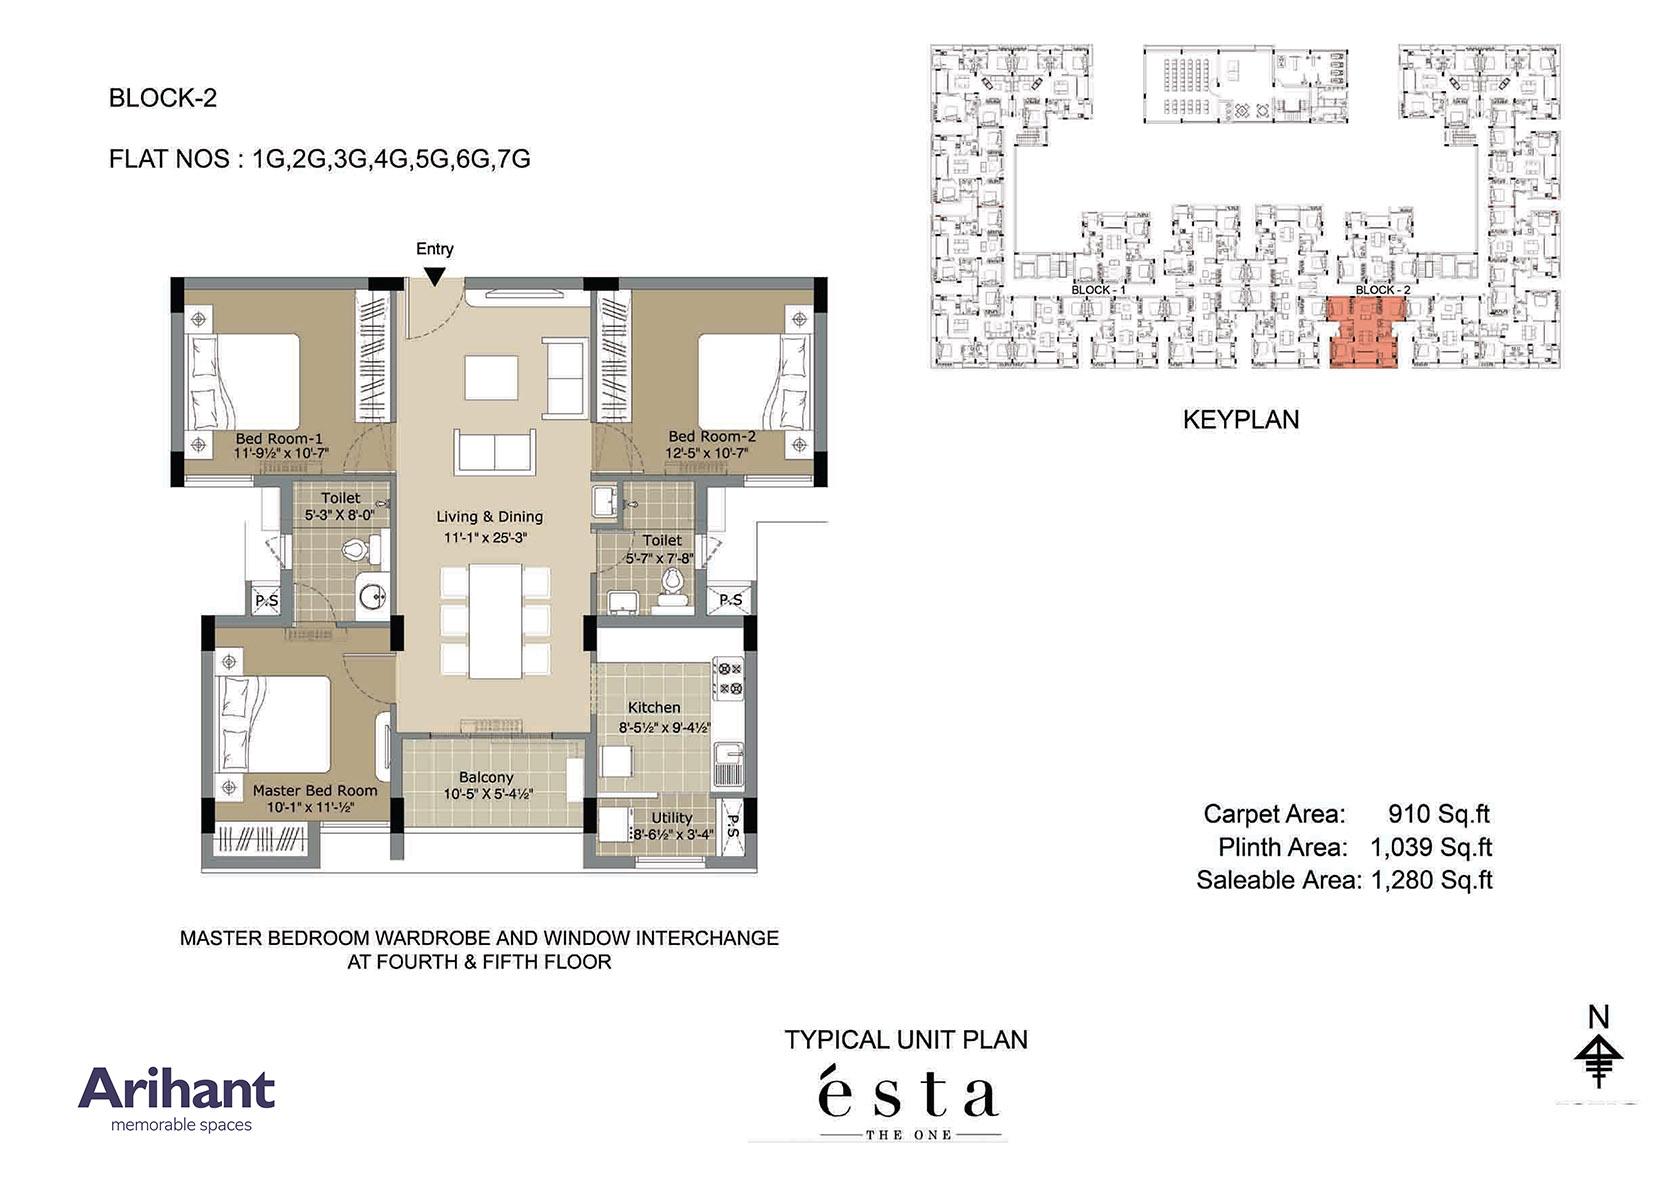 Arihant - Esta_Typical Unit Plan - Block 2 - Type G